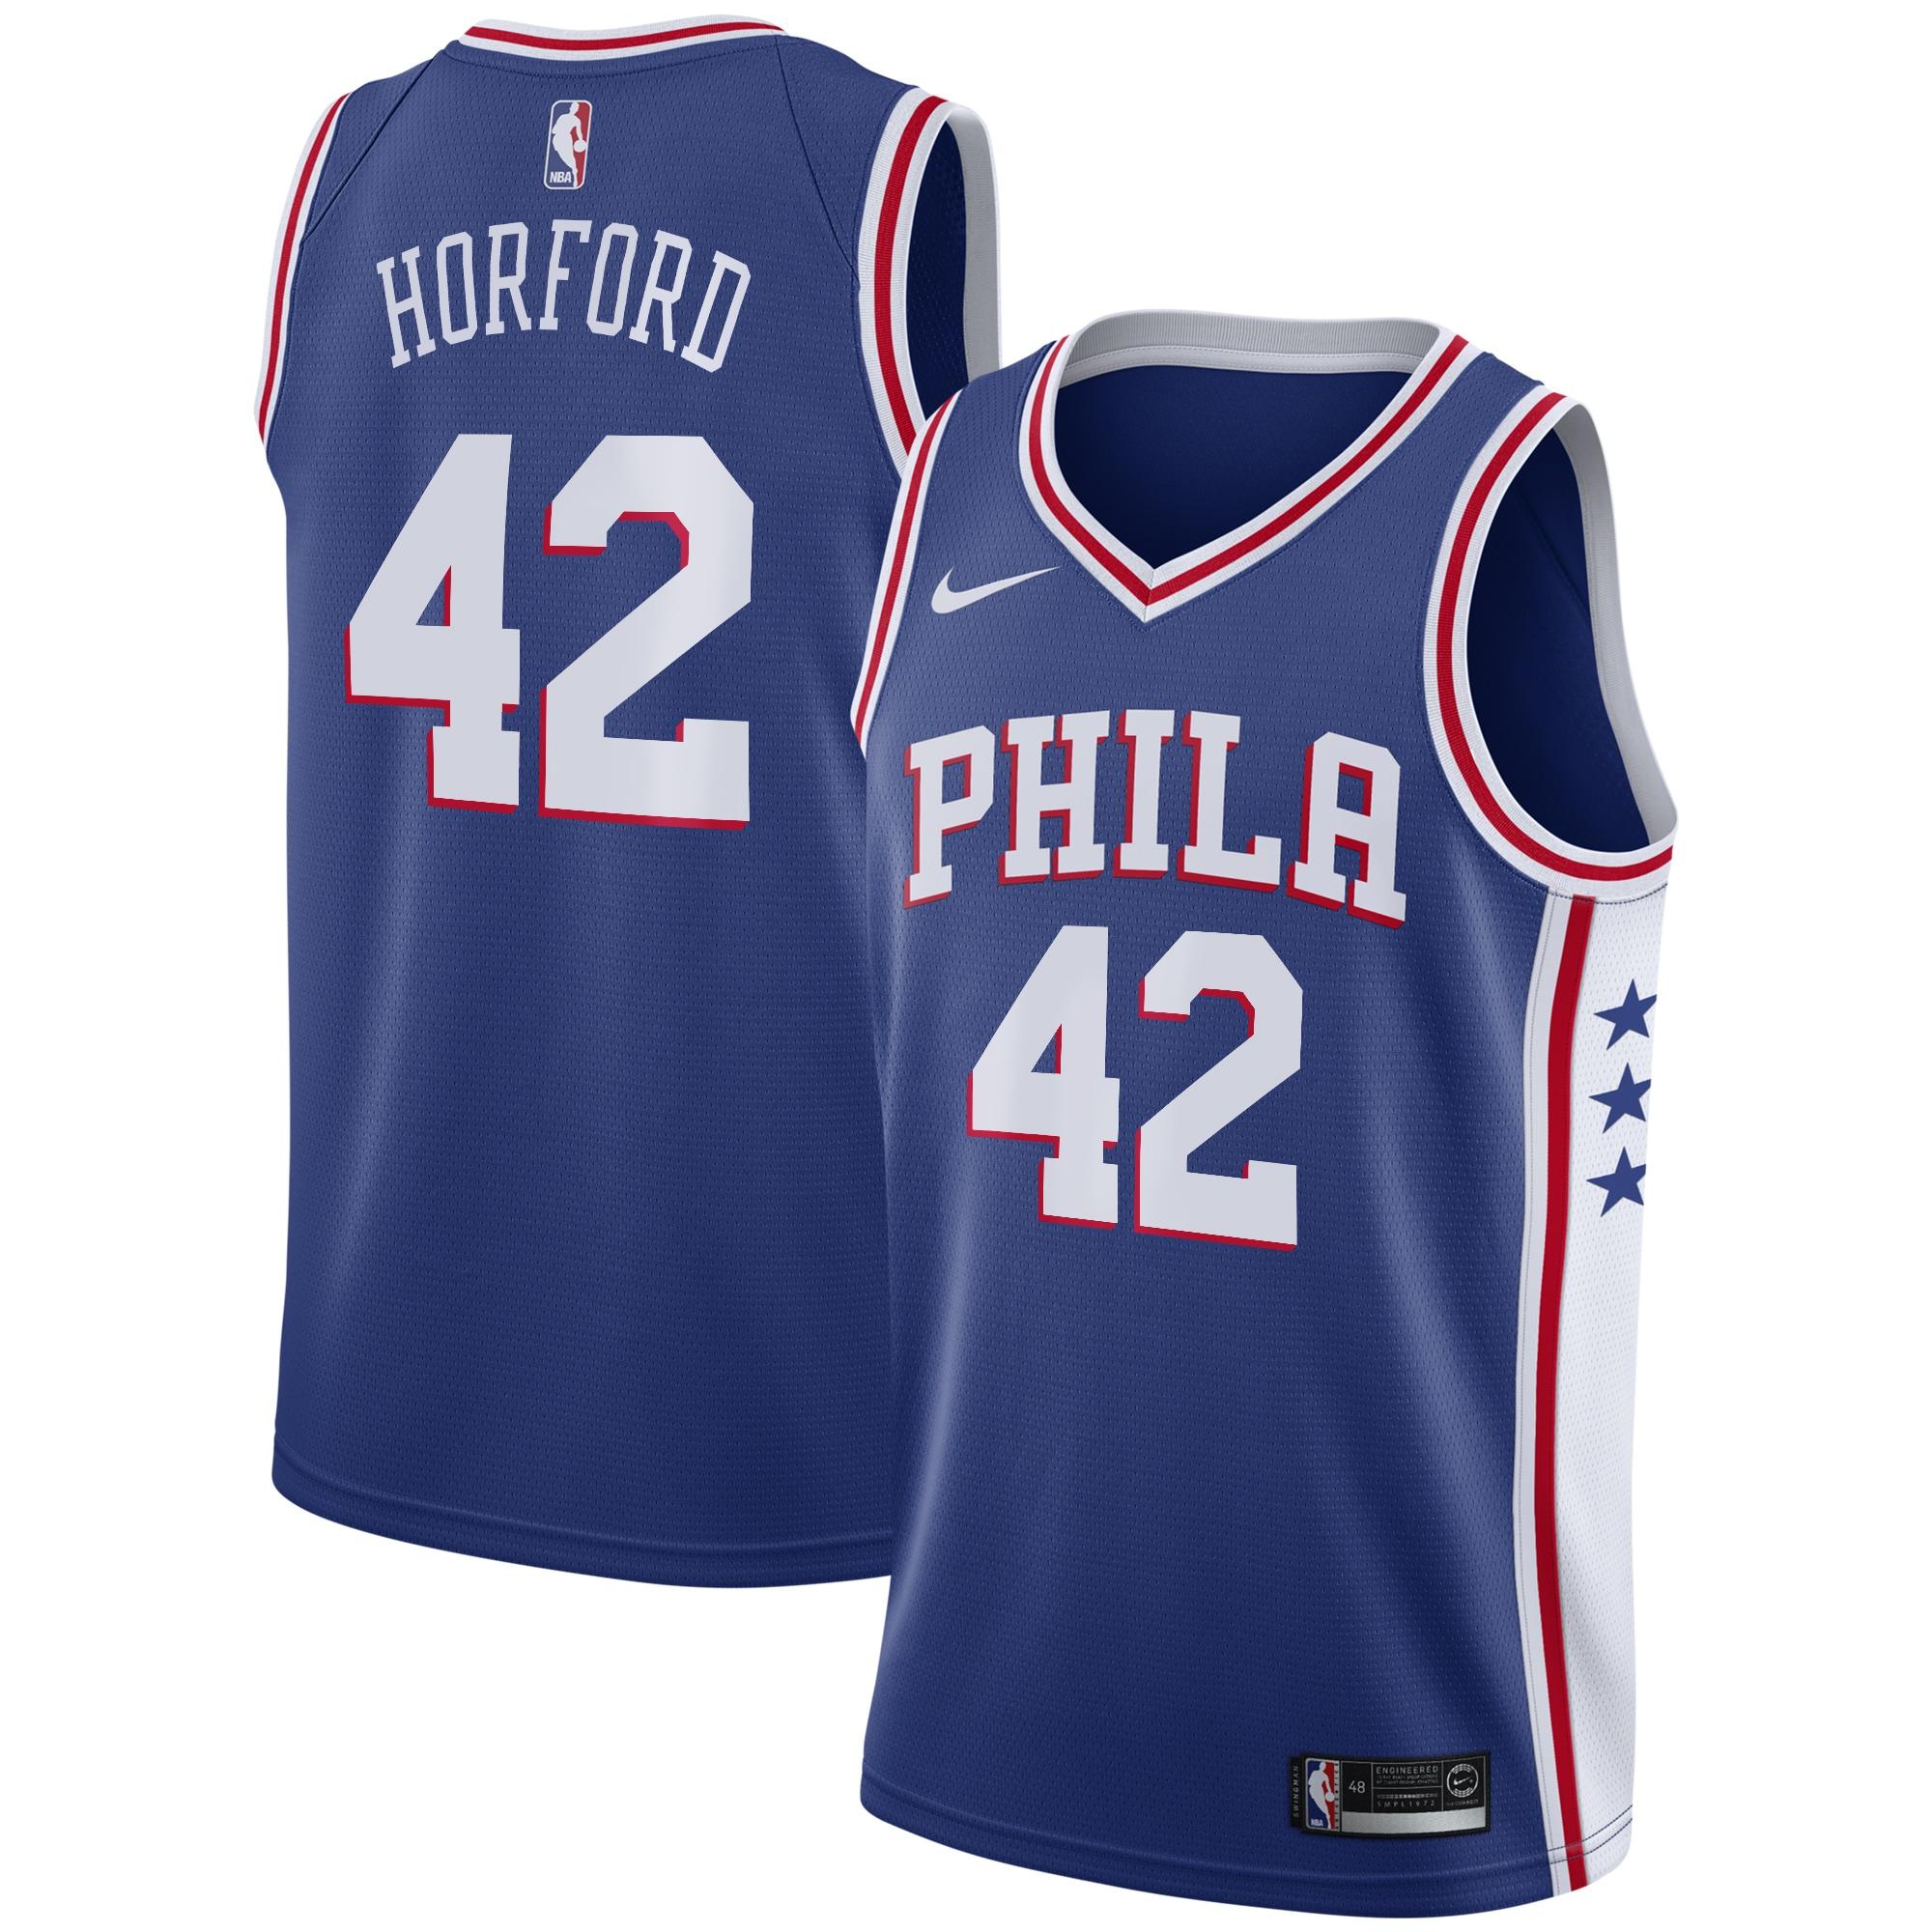 Al Horford Philadelphia 76ers Nike 2019/20 Swingman Jersey Royal - Icon Edition